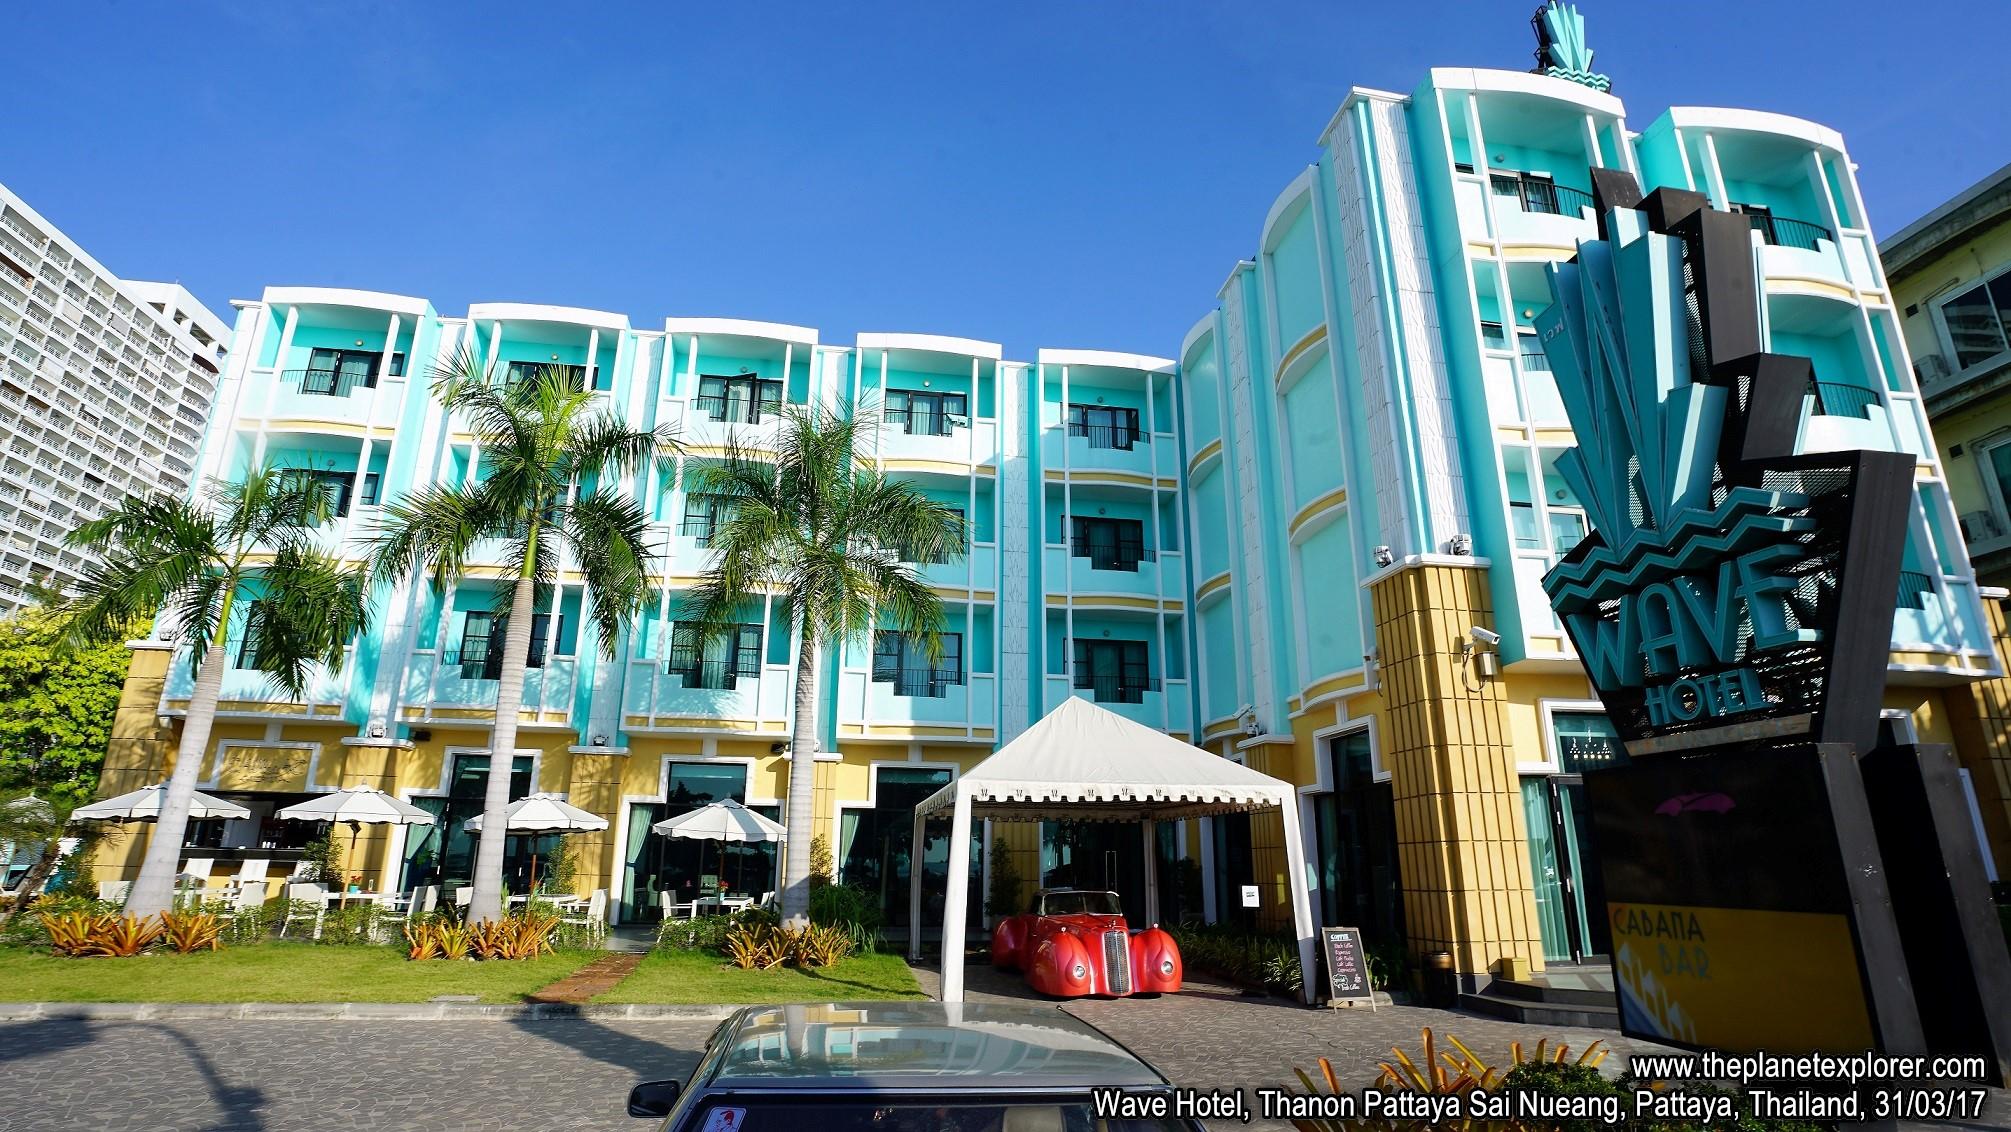 2017-03-31_1659_Thailand_Pattaya_Thanon Pattaya Sai Nueang_Wave Hotel_DSC03964_s7R2_LR_@